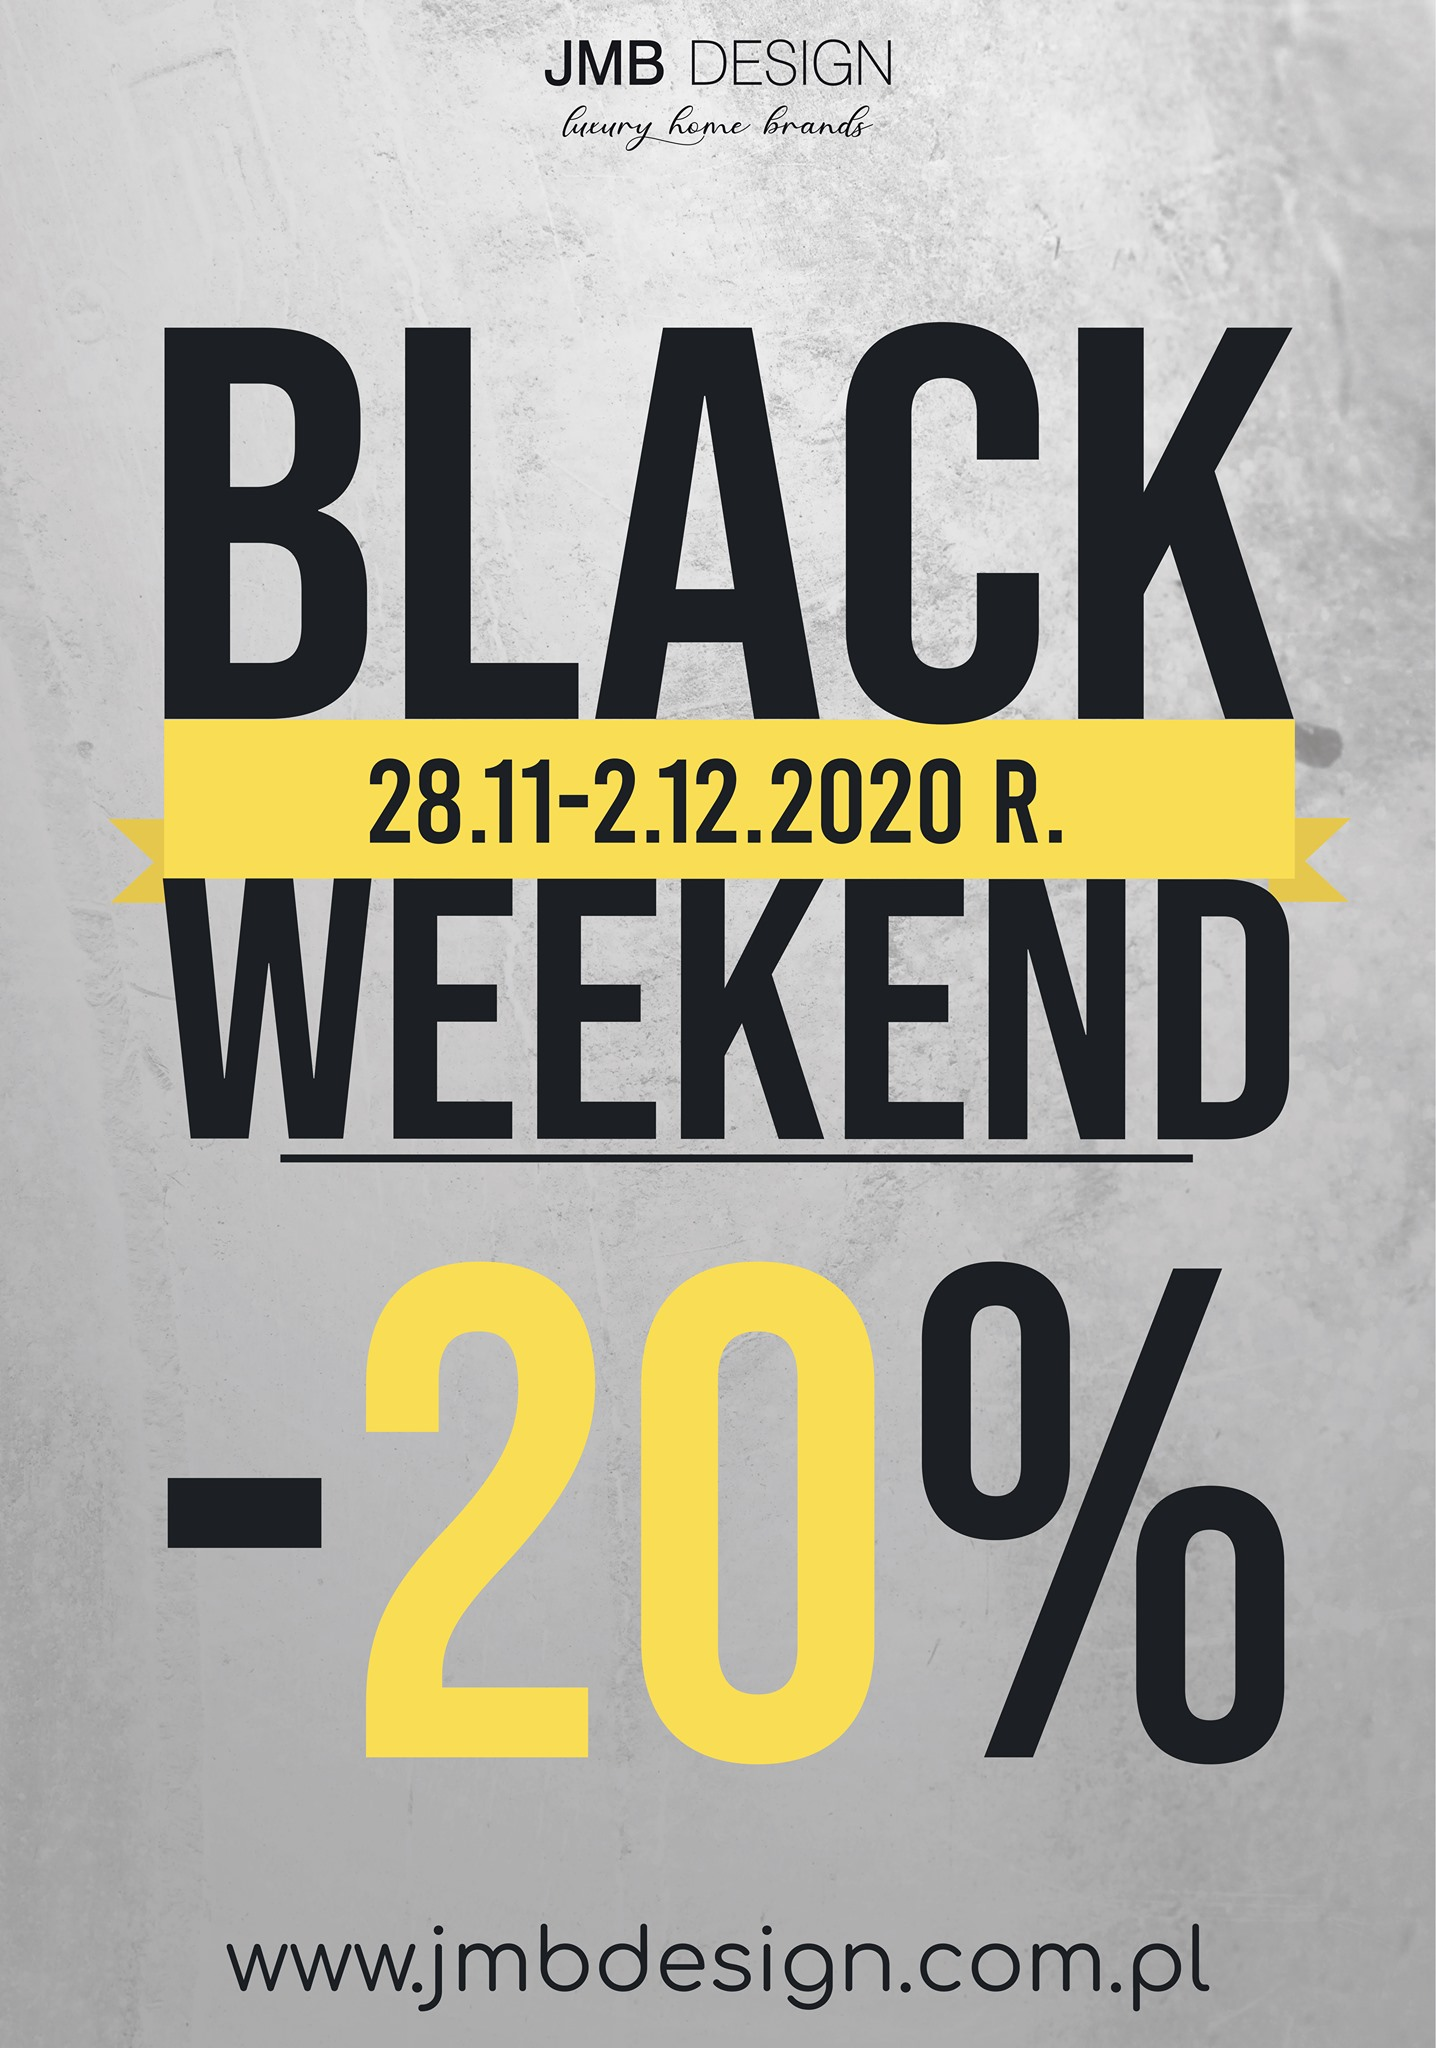 #BlackWeekend w salonie JMB Design